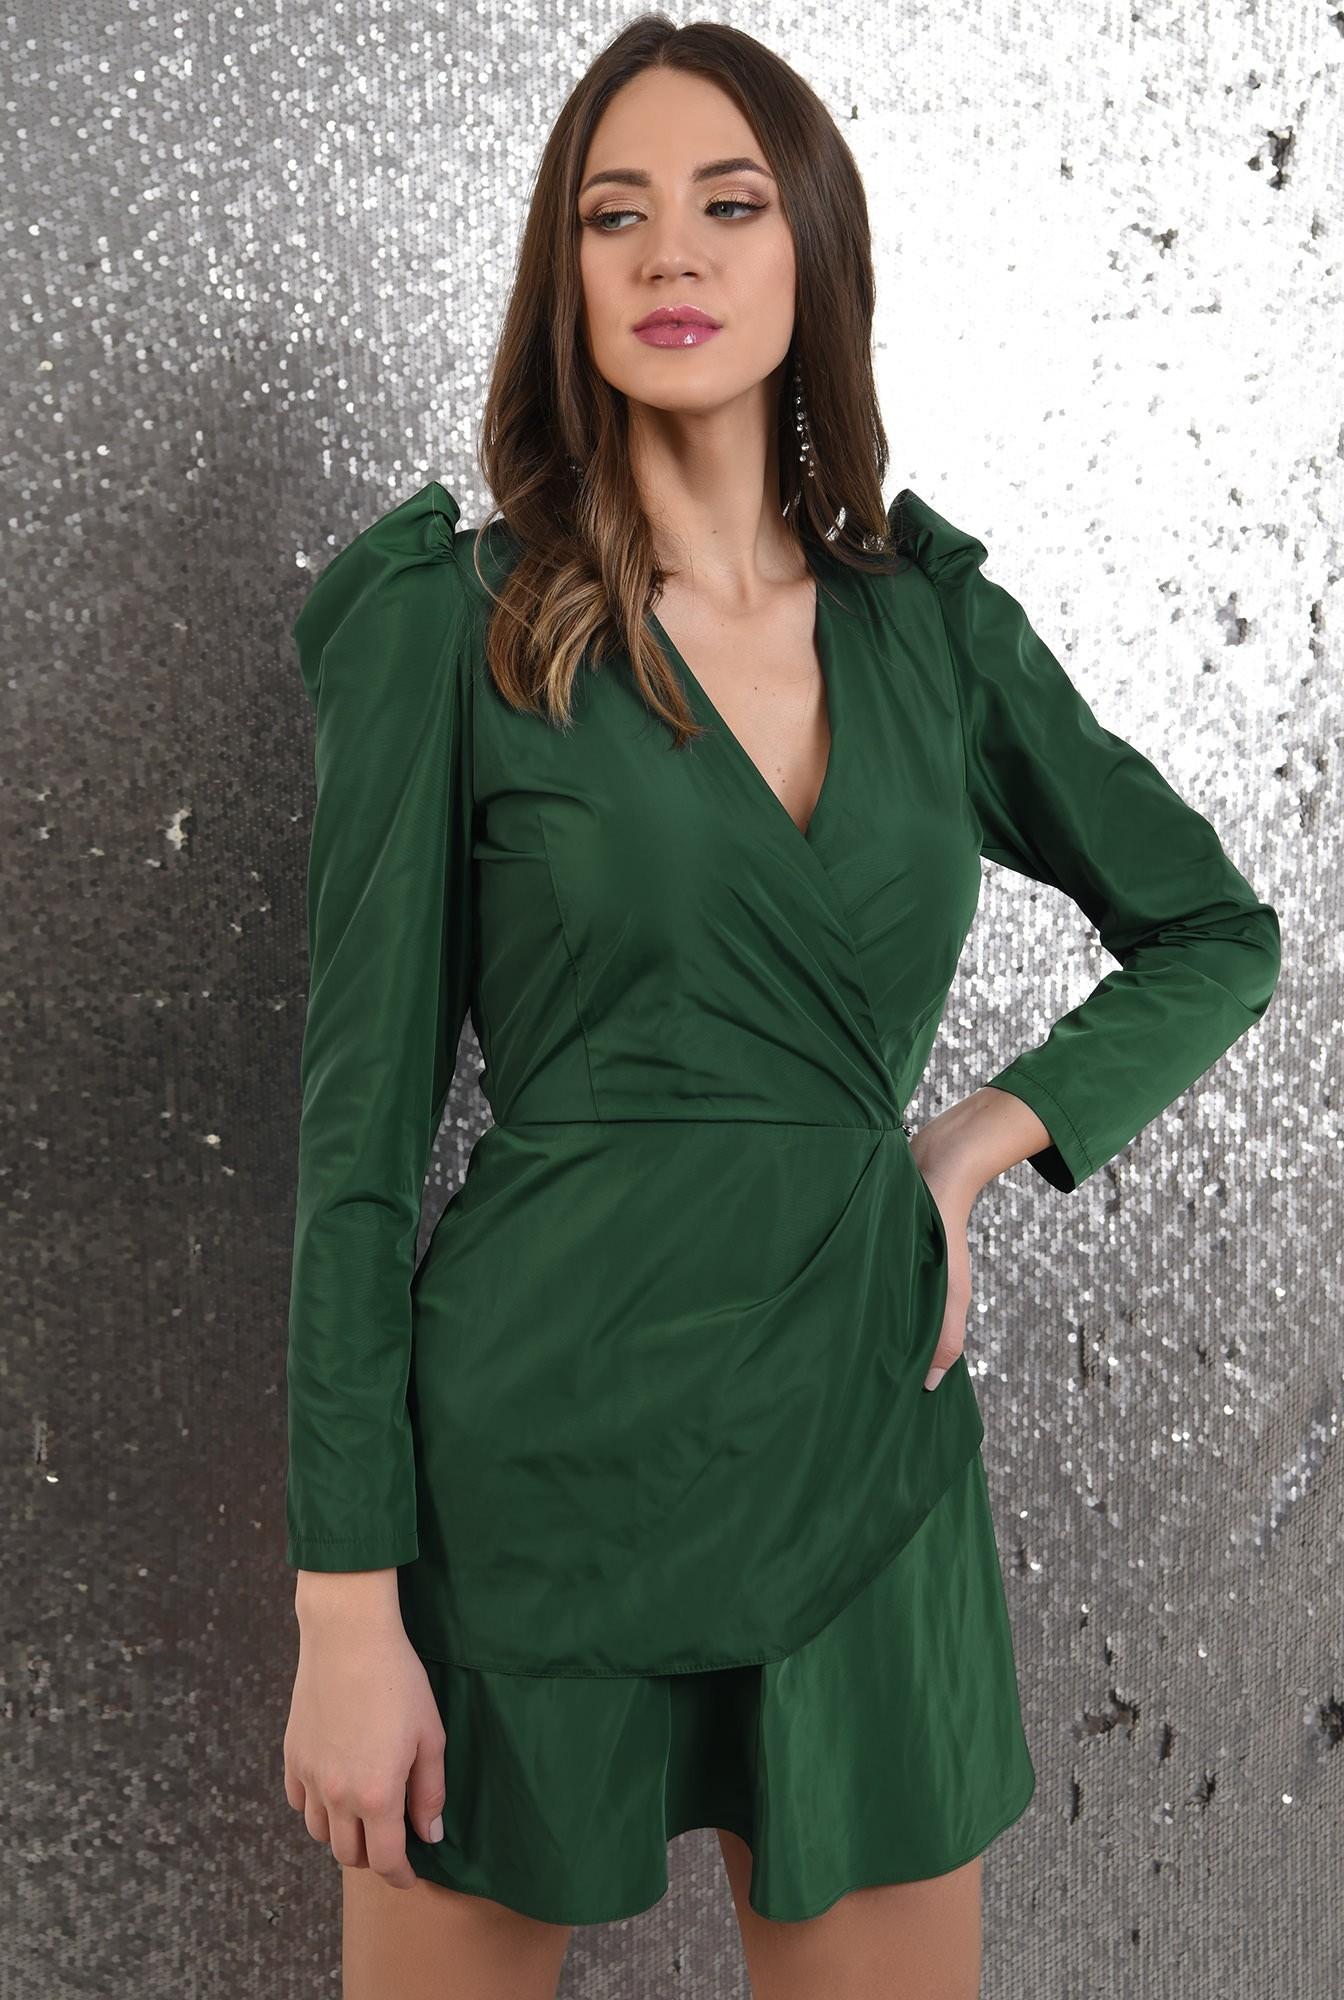 0 - 360 - rochie eleganta, petrecuta, cu pliuri decorative, maneci lungi, Poema